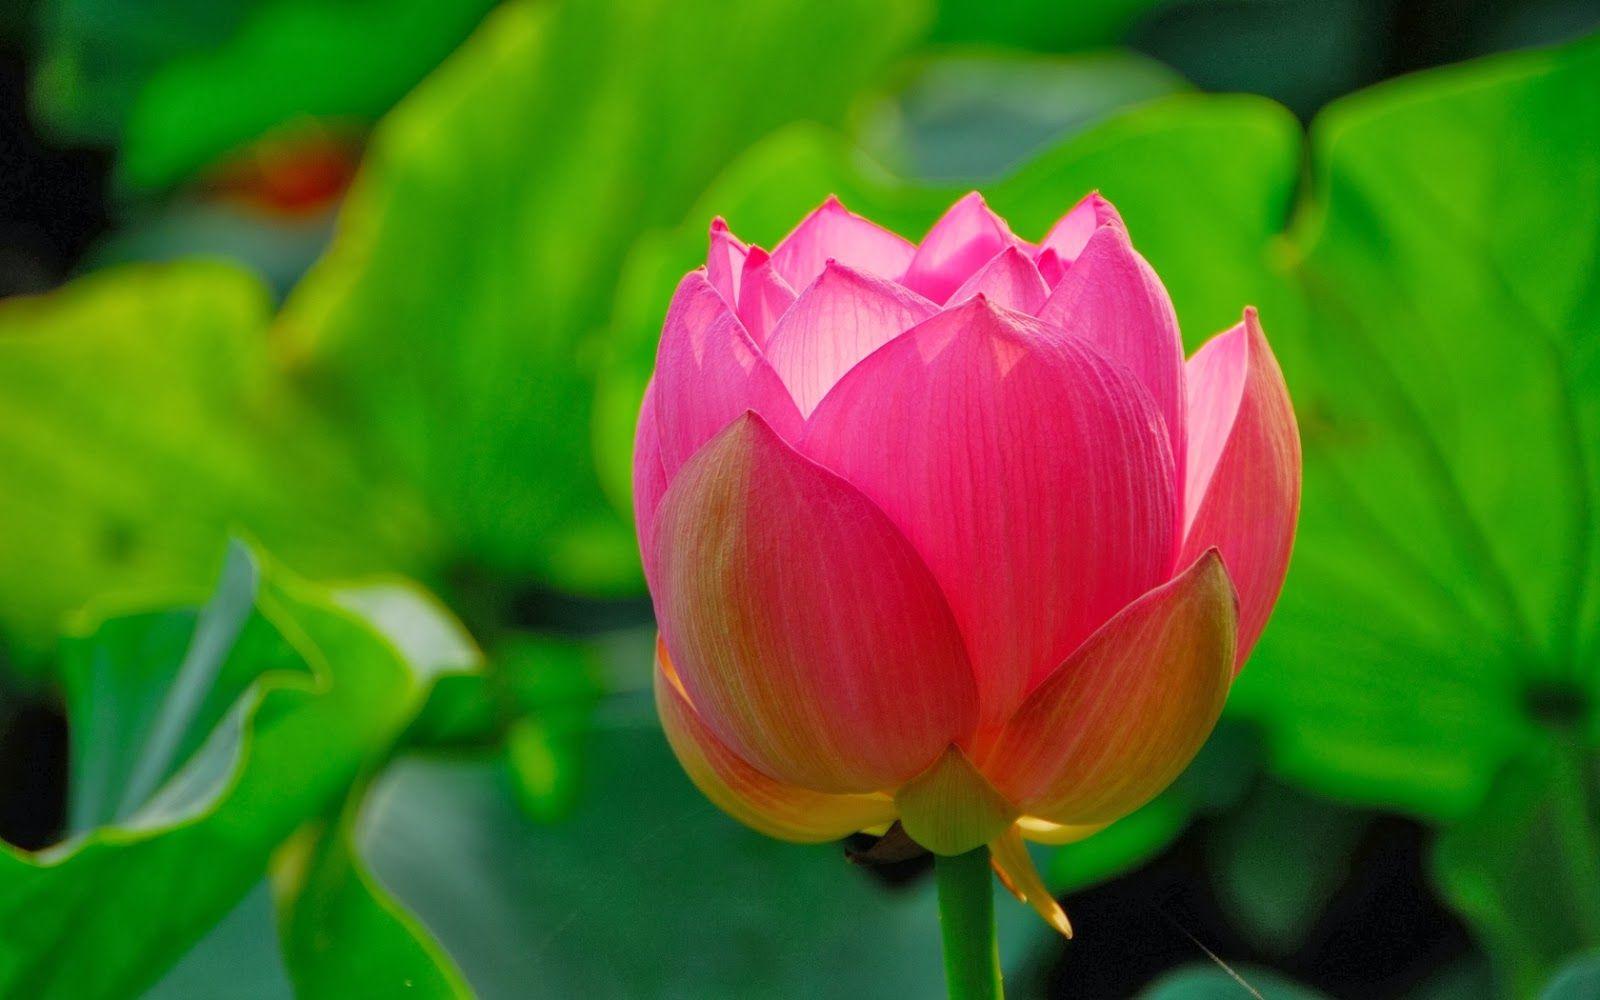 Fotos de flores bonitas gratis para fondo de pantalla en - Fotos de flores bonitas ...